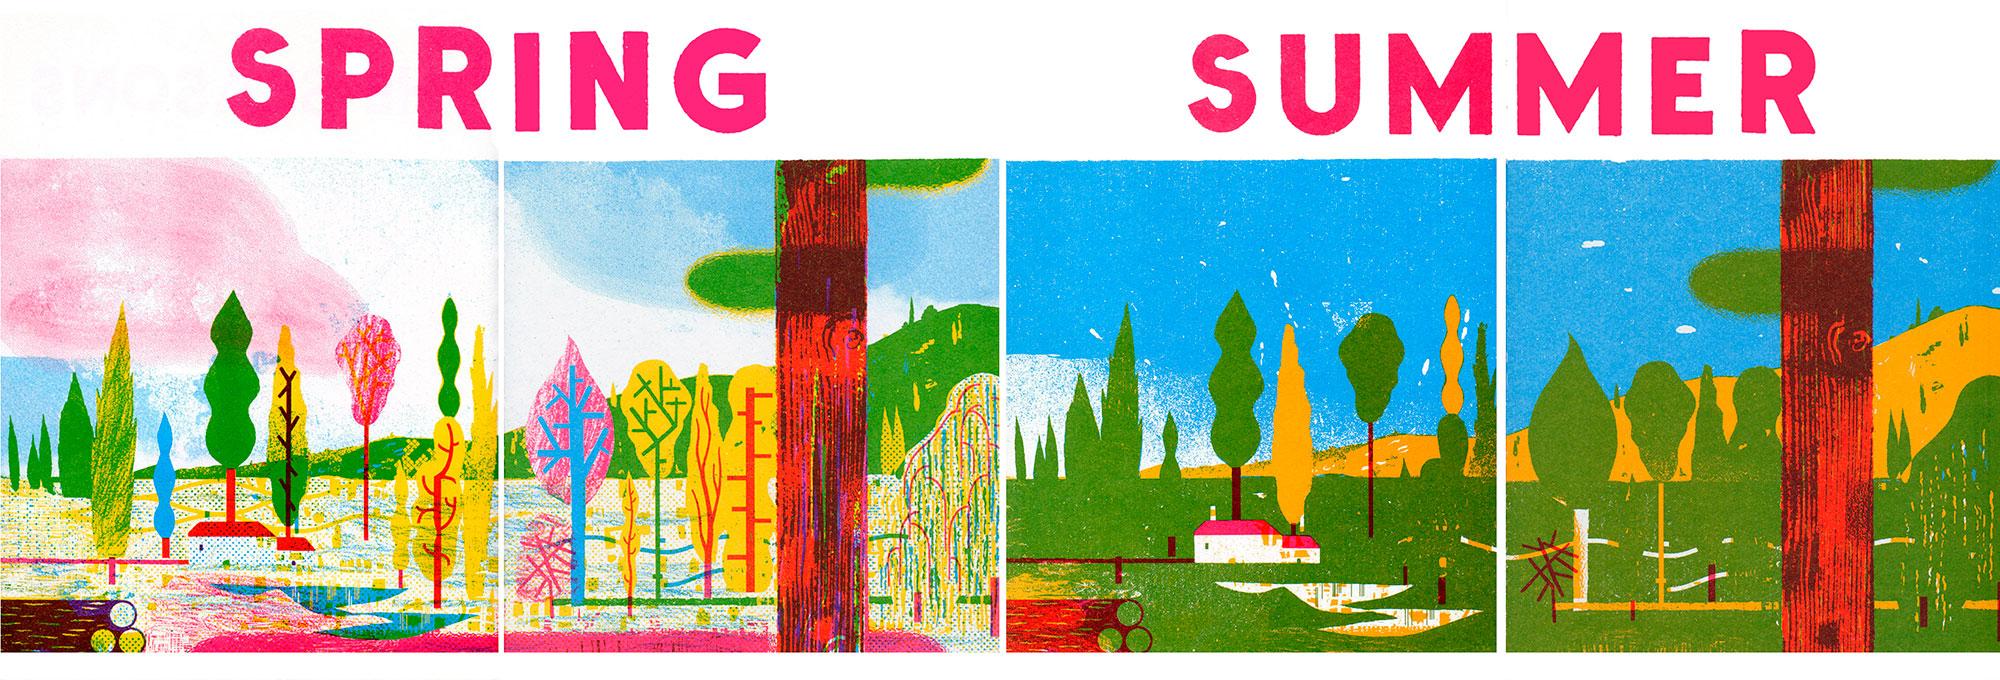 blexbolex-saisons-spring-summer